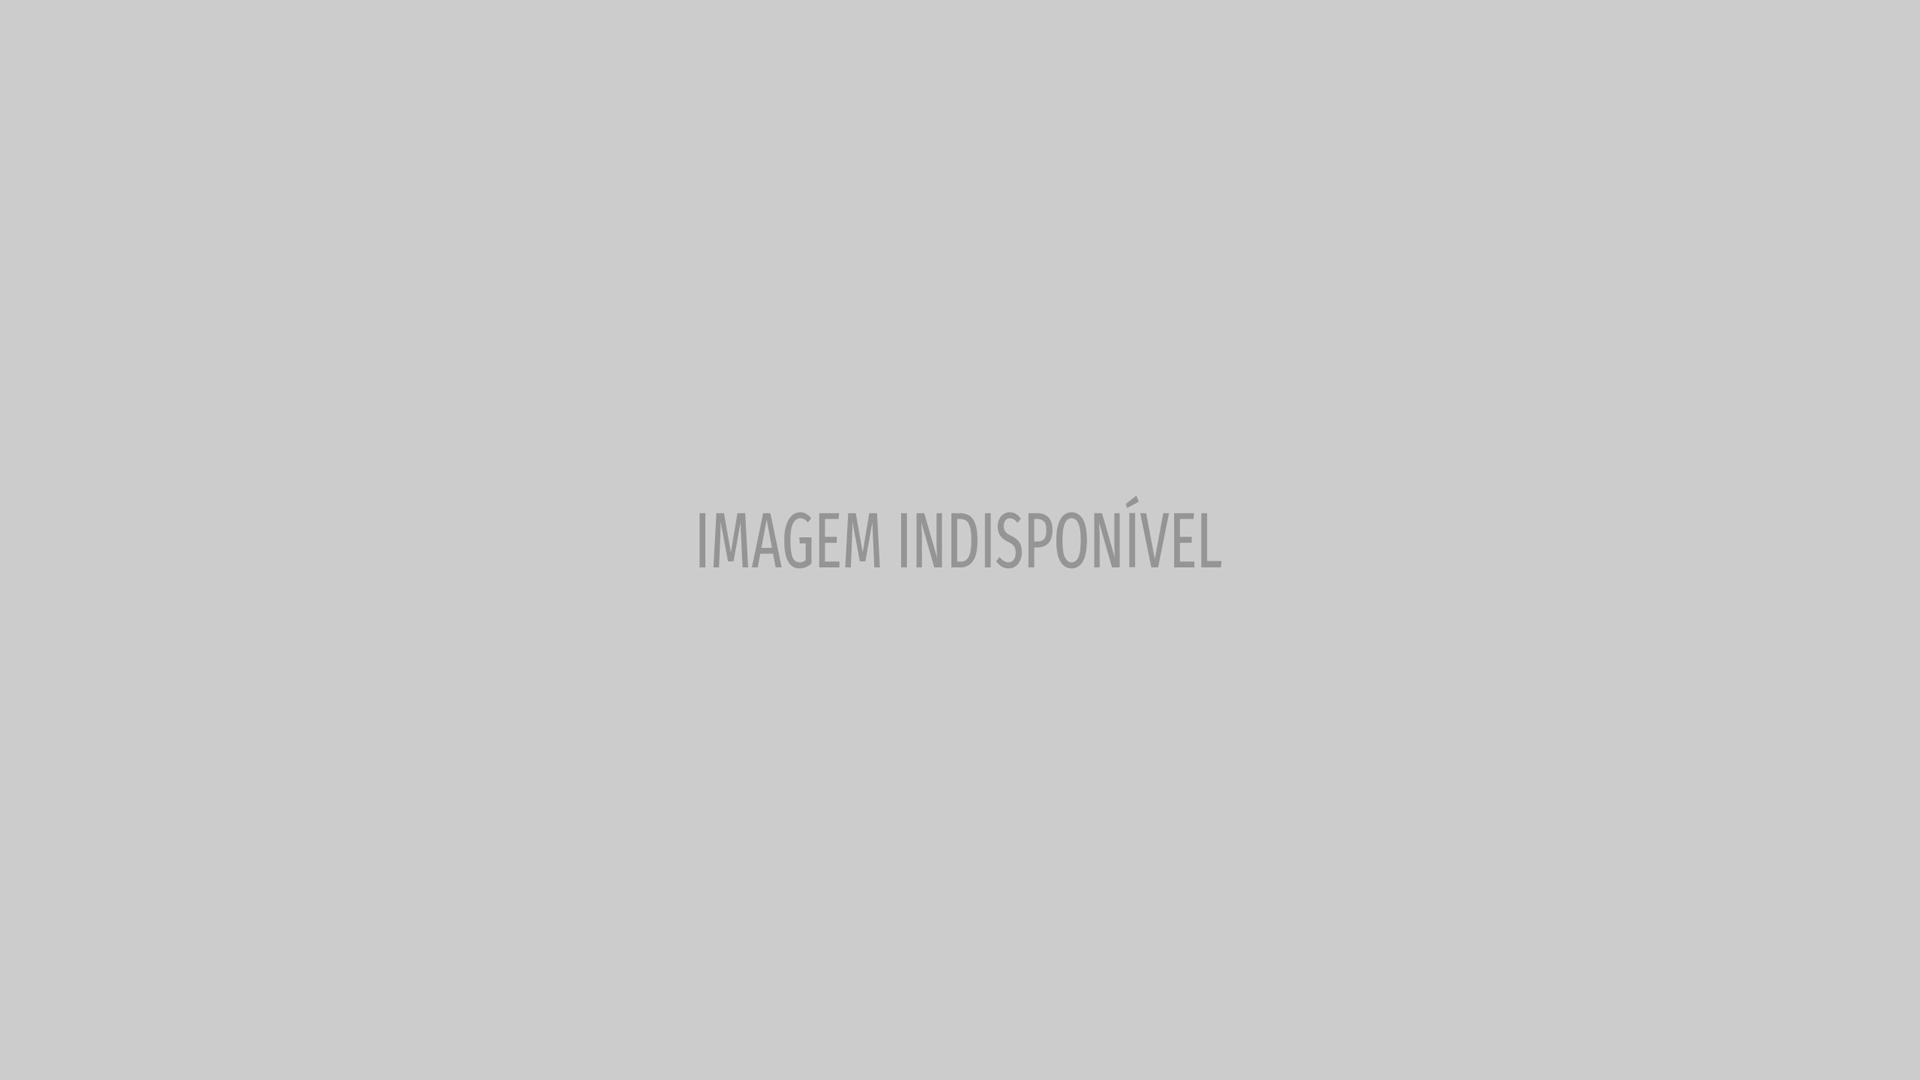 Mariana Rios brinca sobre estar sozinha no casamento de Isis Valverde